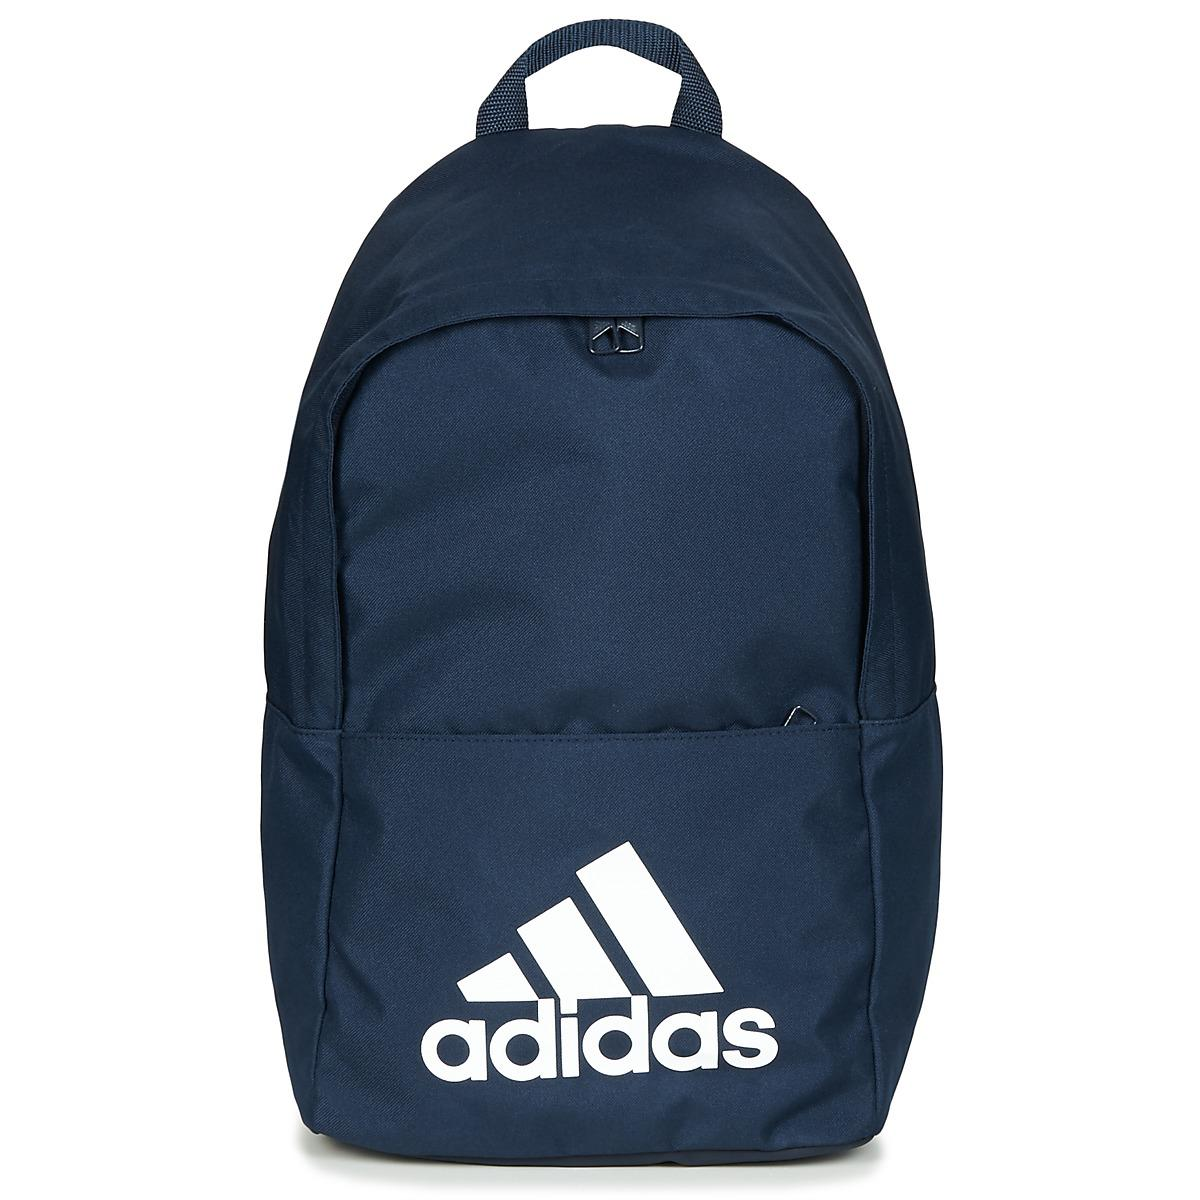 114ec6bf660 Adidas - Classic Bp Men s Backpack In Blue for Men - Lyst. View fullscreen